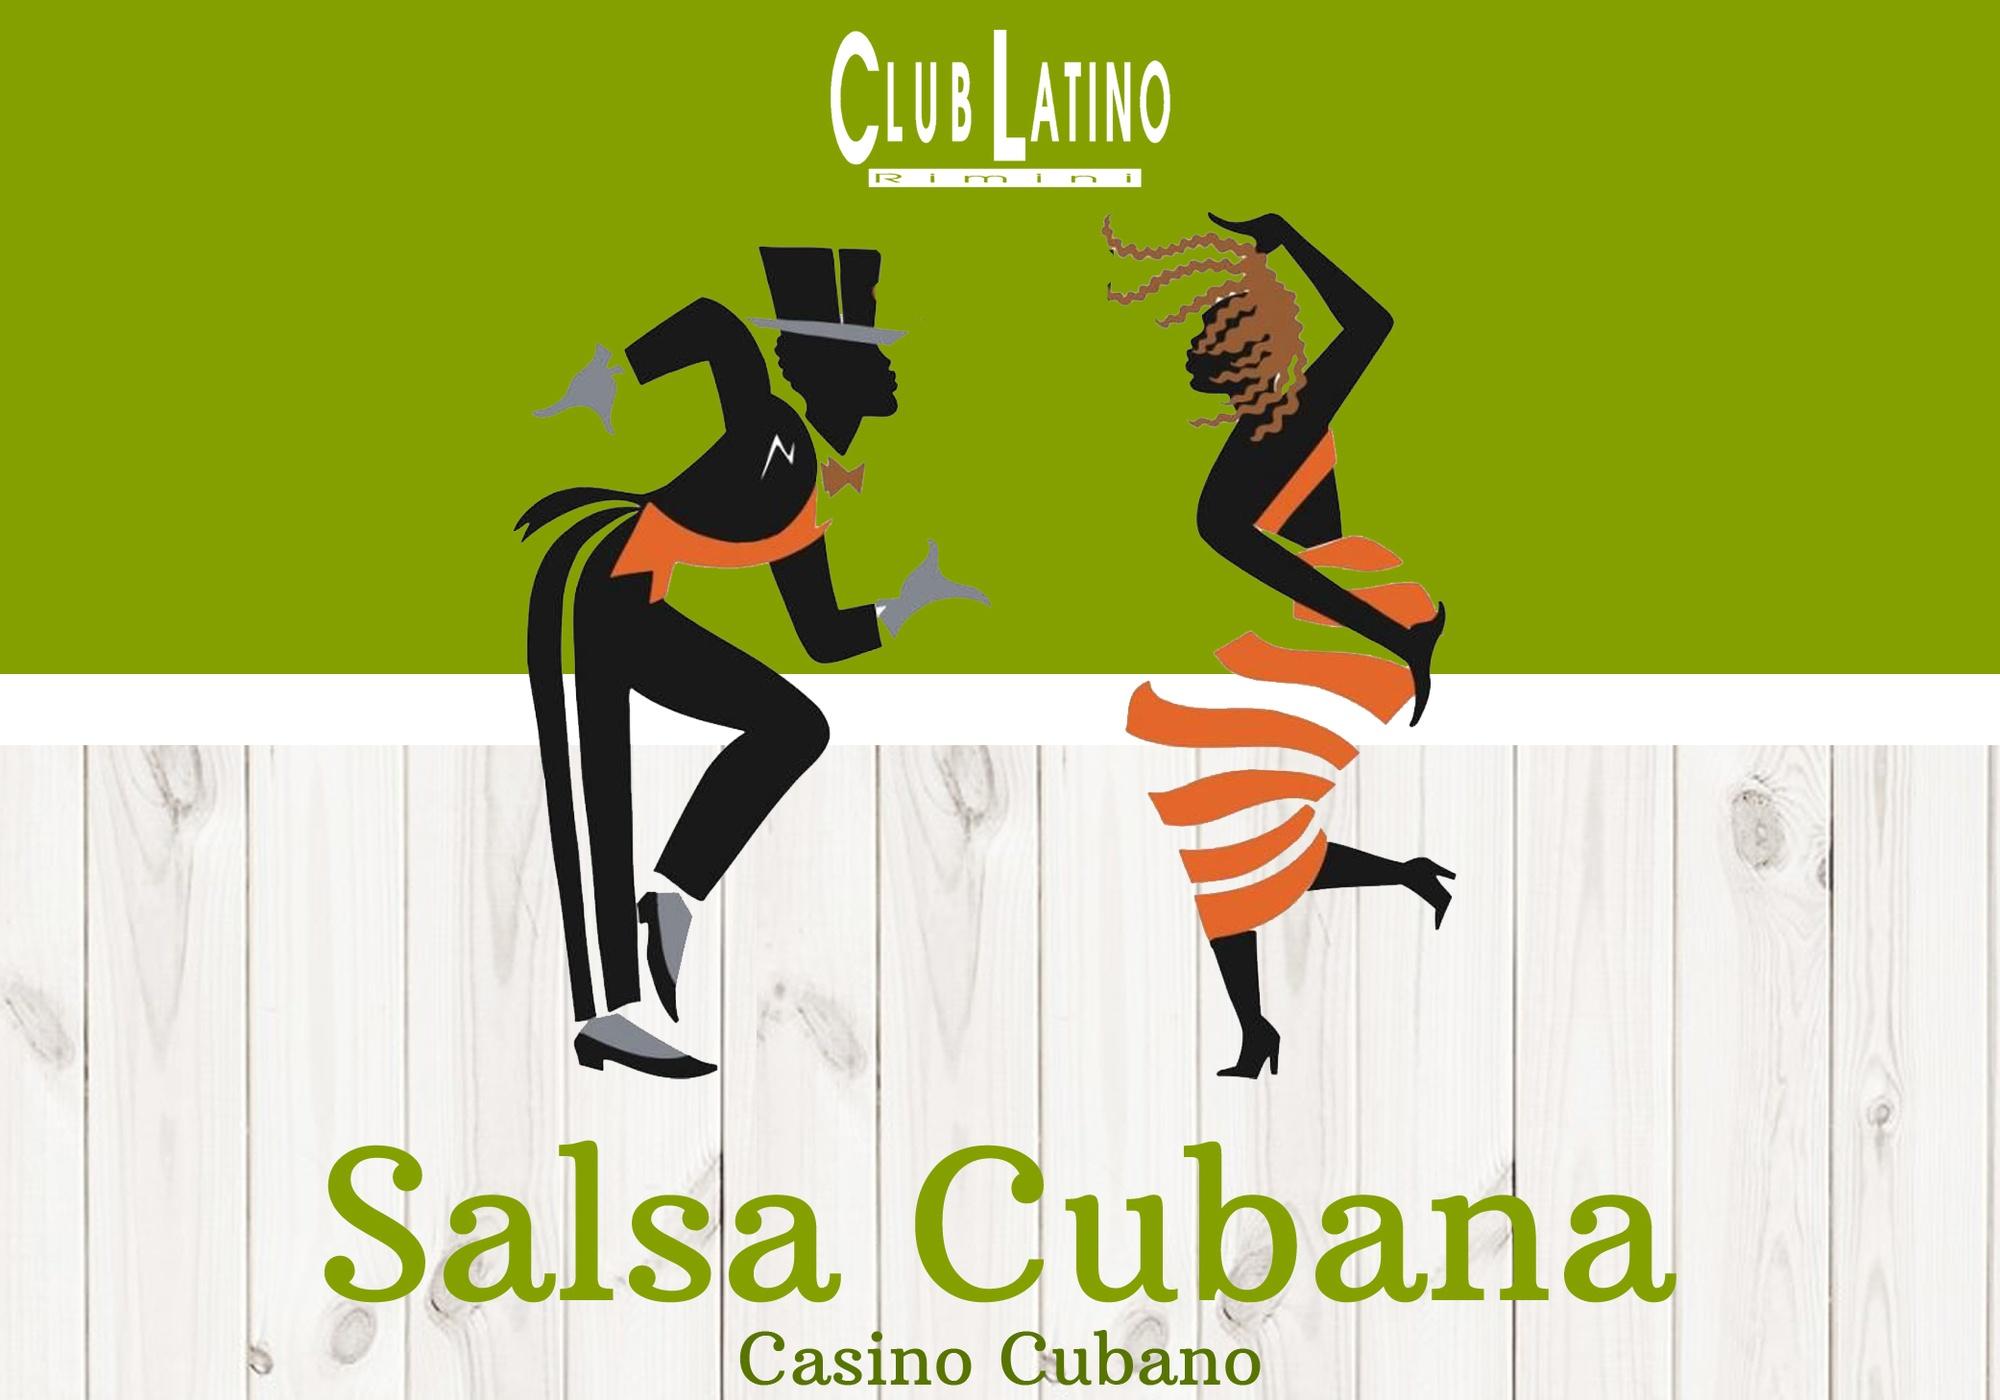 Corso Cubana 2020